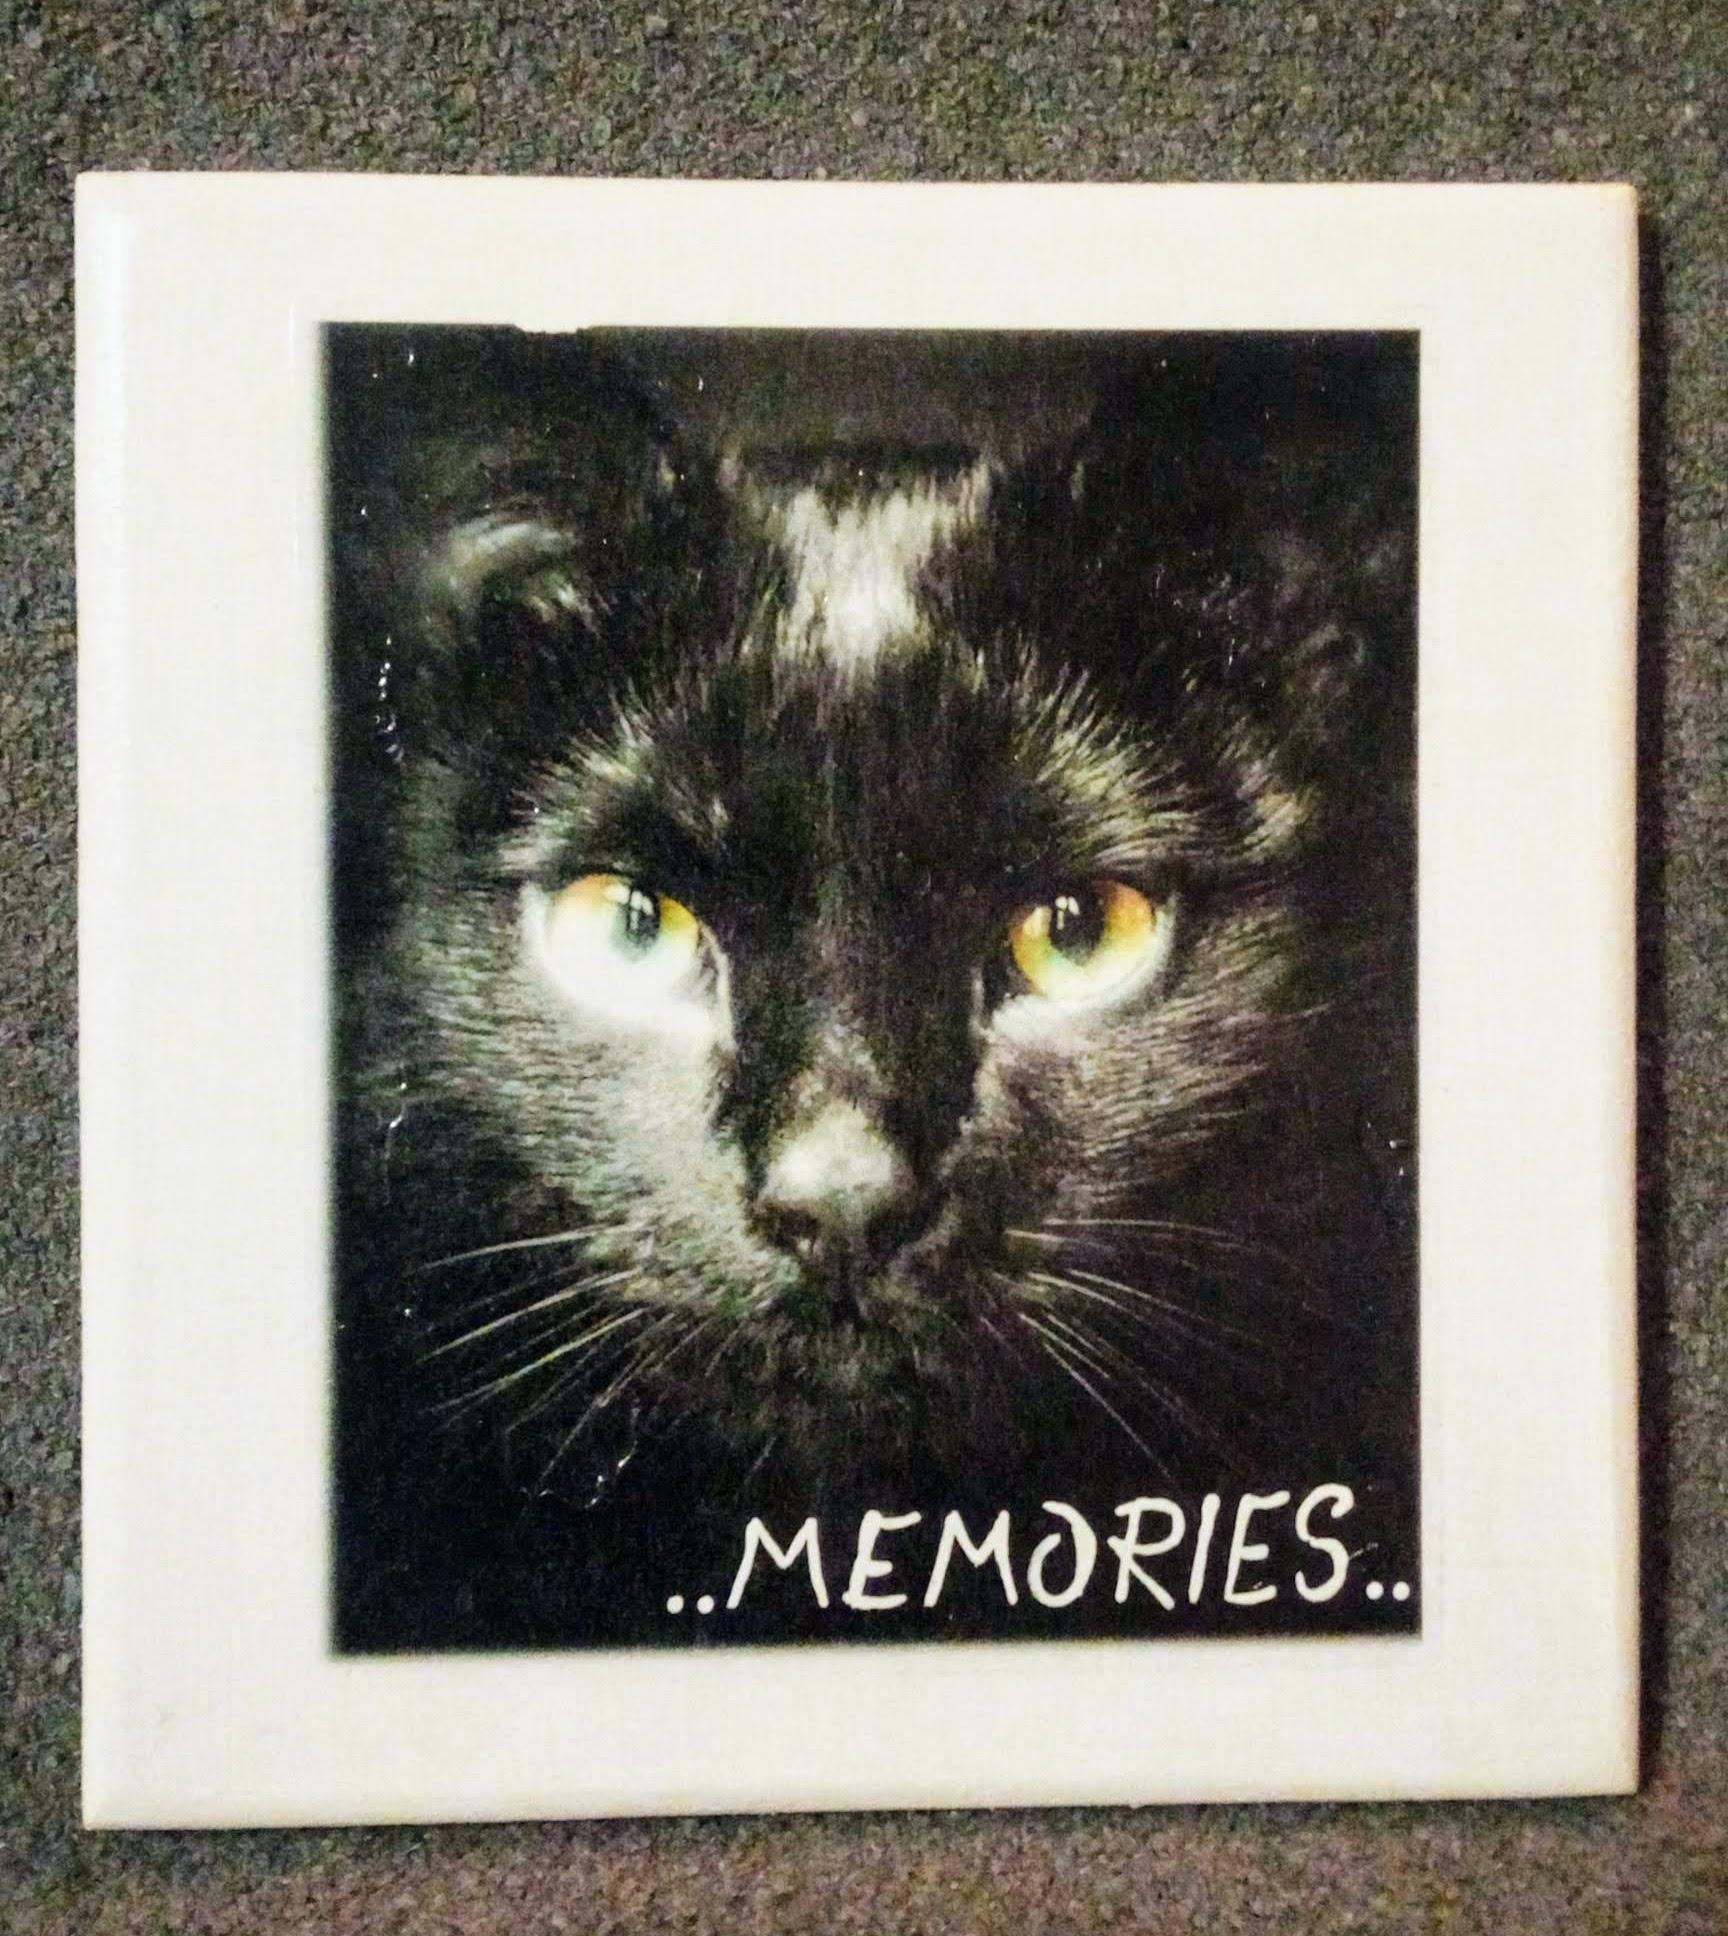 Herinneringsbord voorzien van afbeelding (foto) en tekst